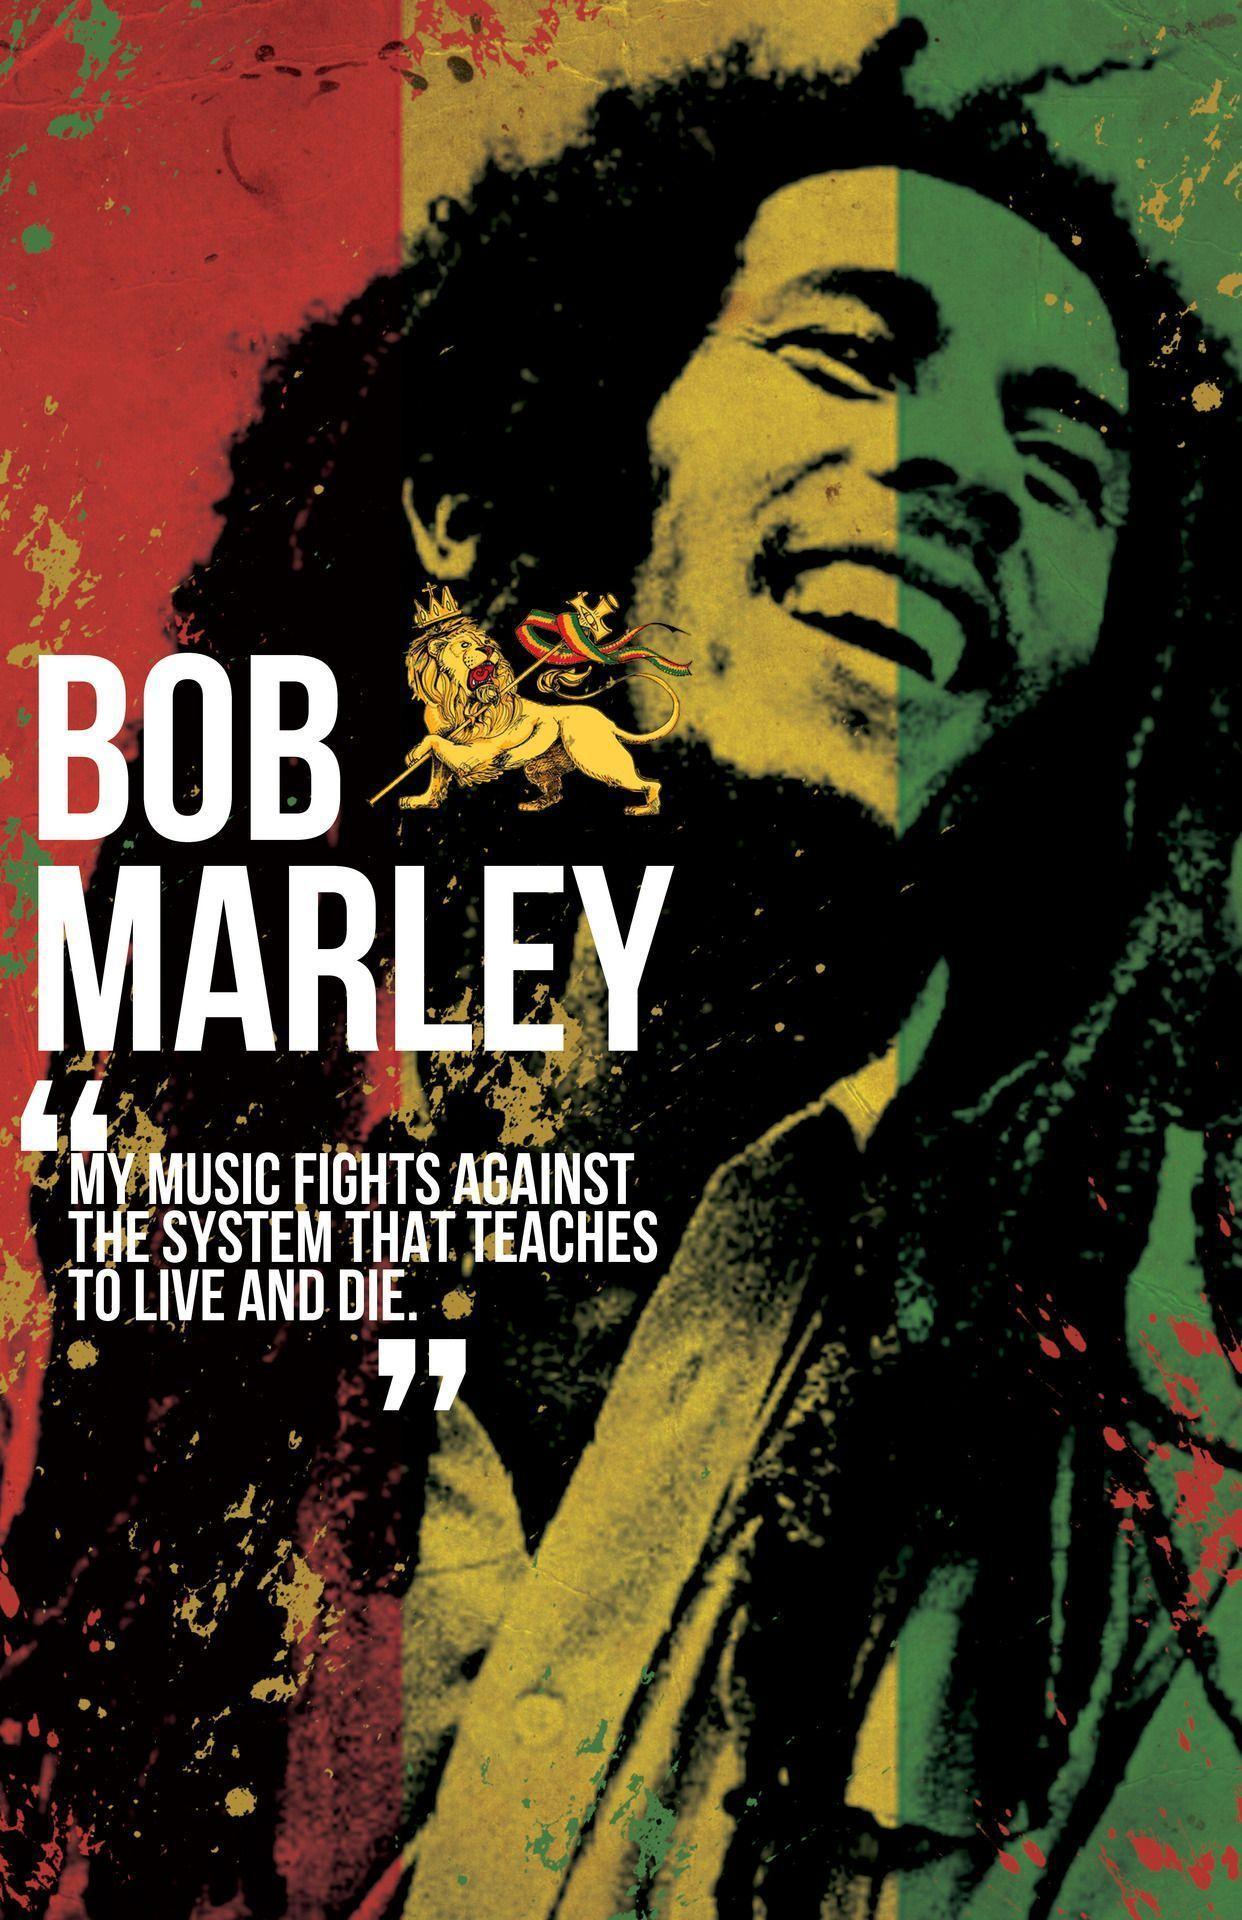 Bob Marley Hd Wallpapers Wallpaper Bob Marley Art Bob Marley Poster Bob Marley Legend